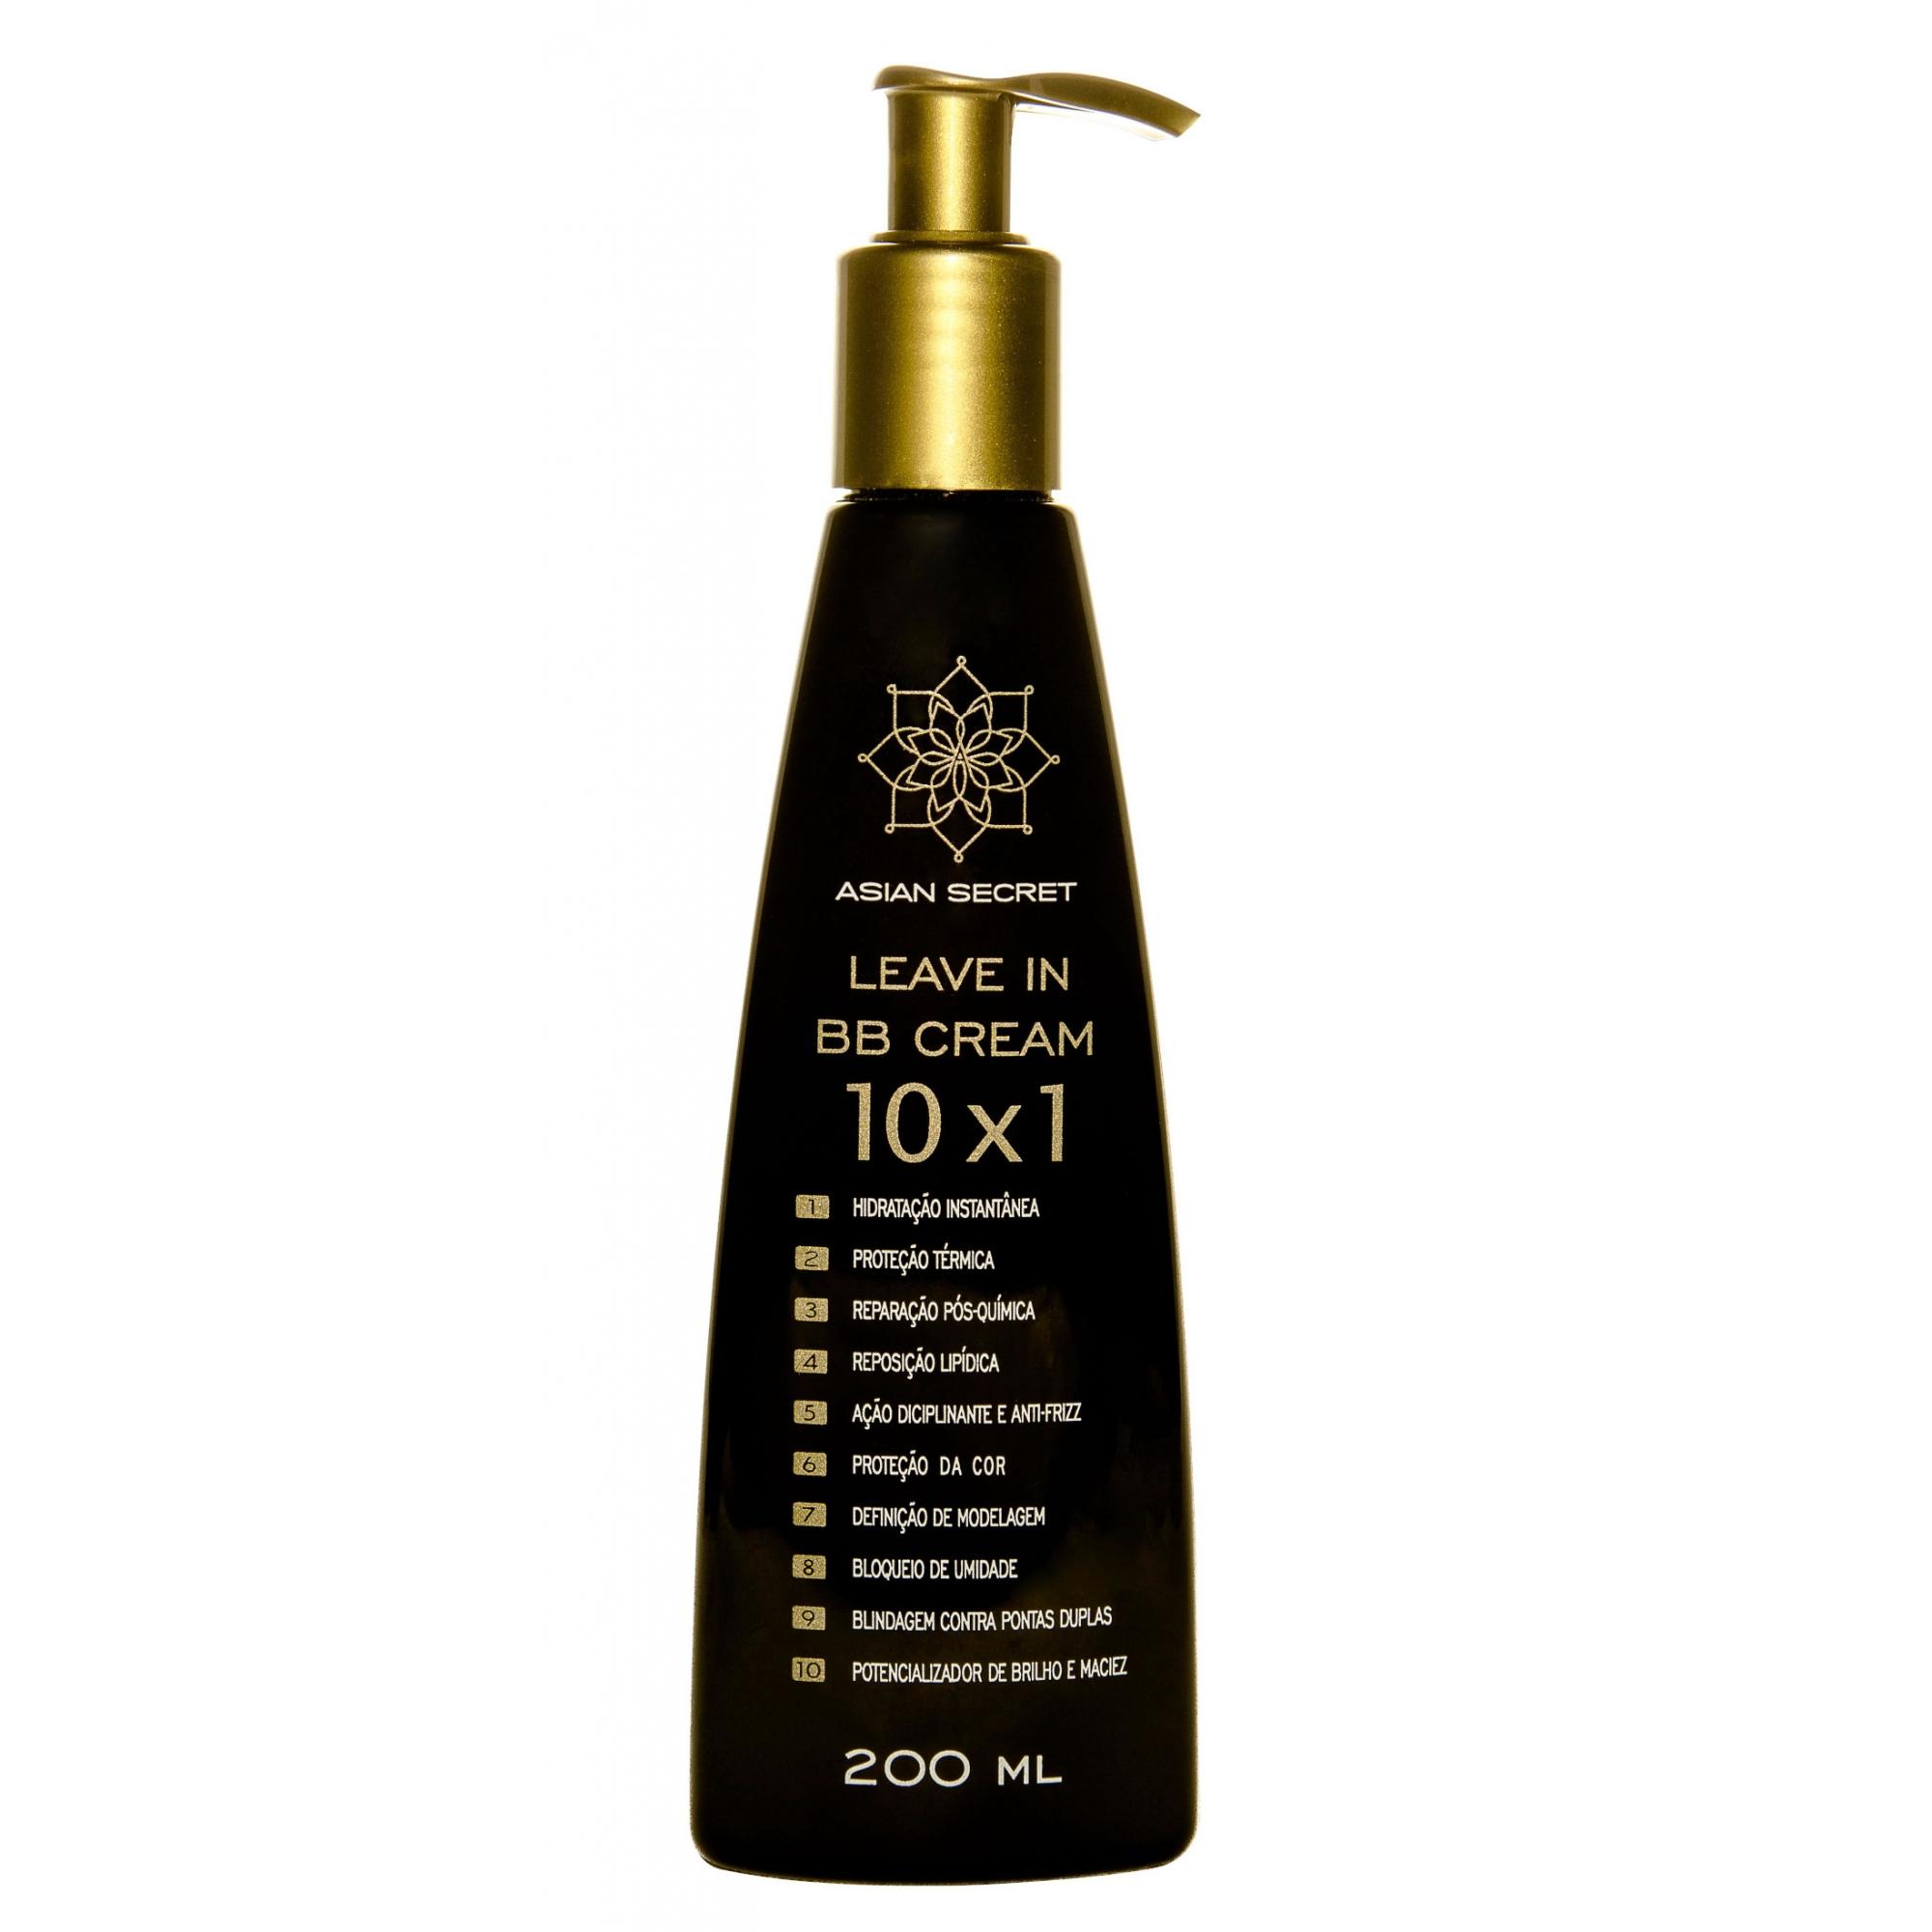 Leave-in 10x1 BB Cream 200ml